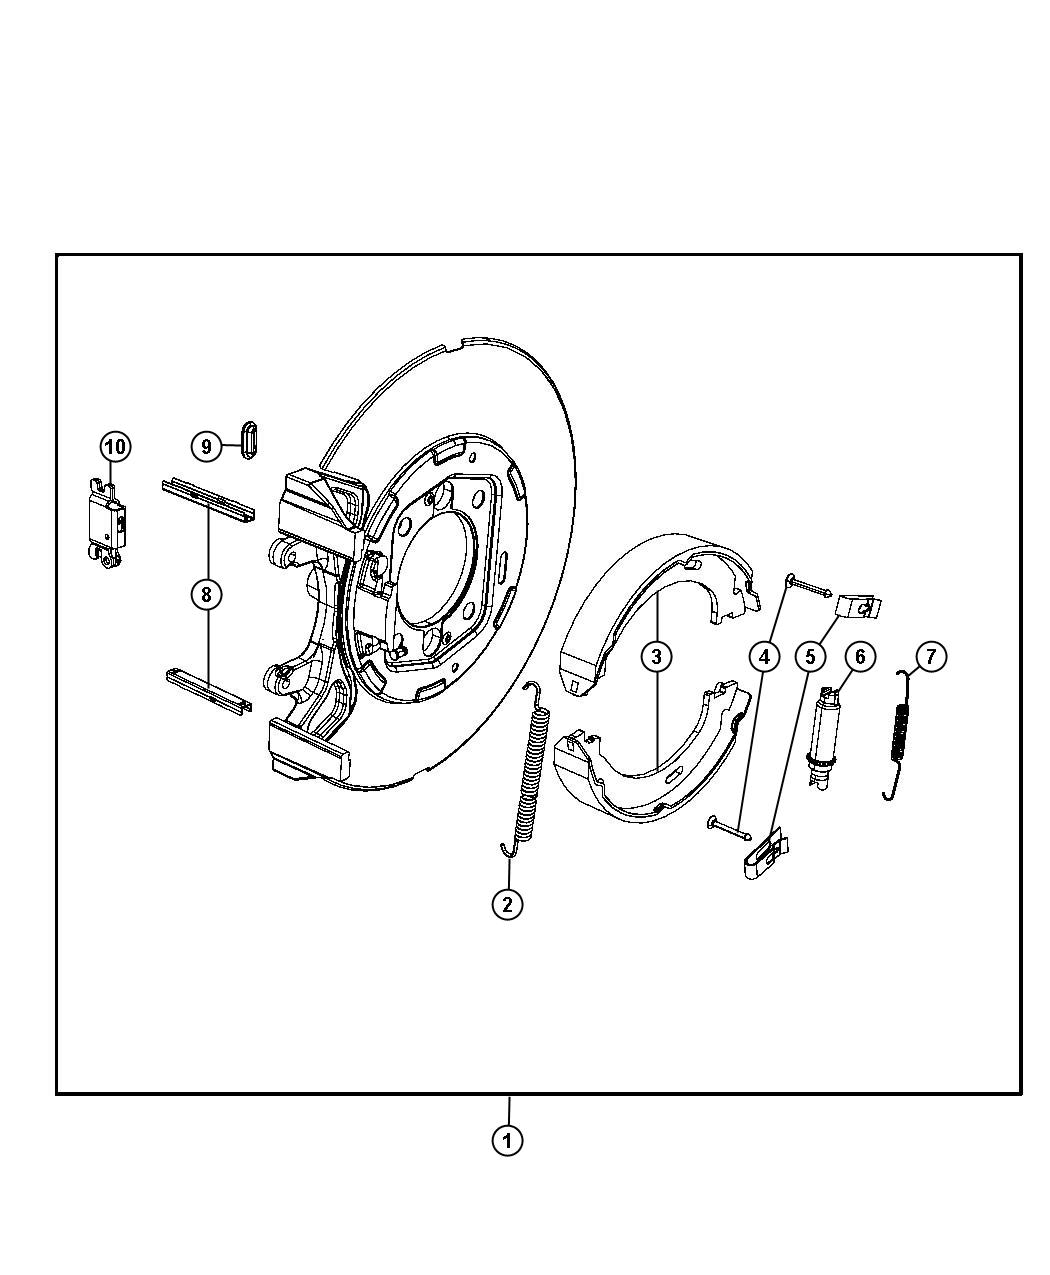 tags: #2008 jeep patriot rear brakes#jeep liberty rear brake diagram#2002  jeep liberty rear brake diagram#2004 jeep cherokee brake diagram#jeep rear  brake